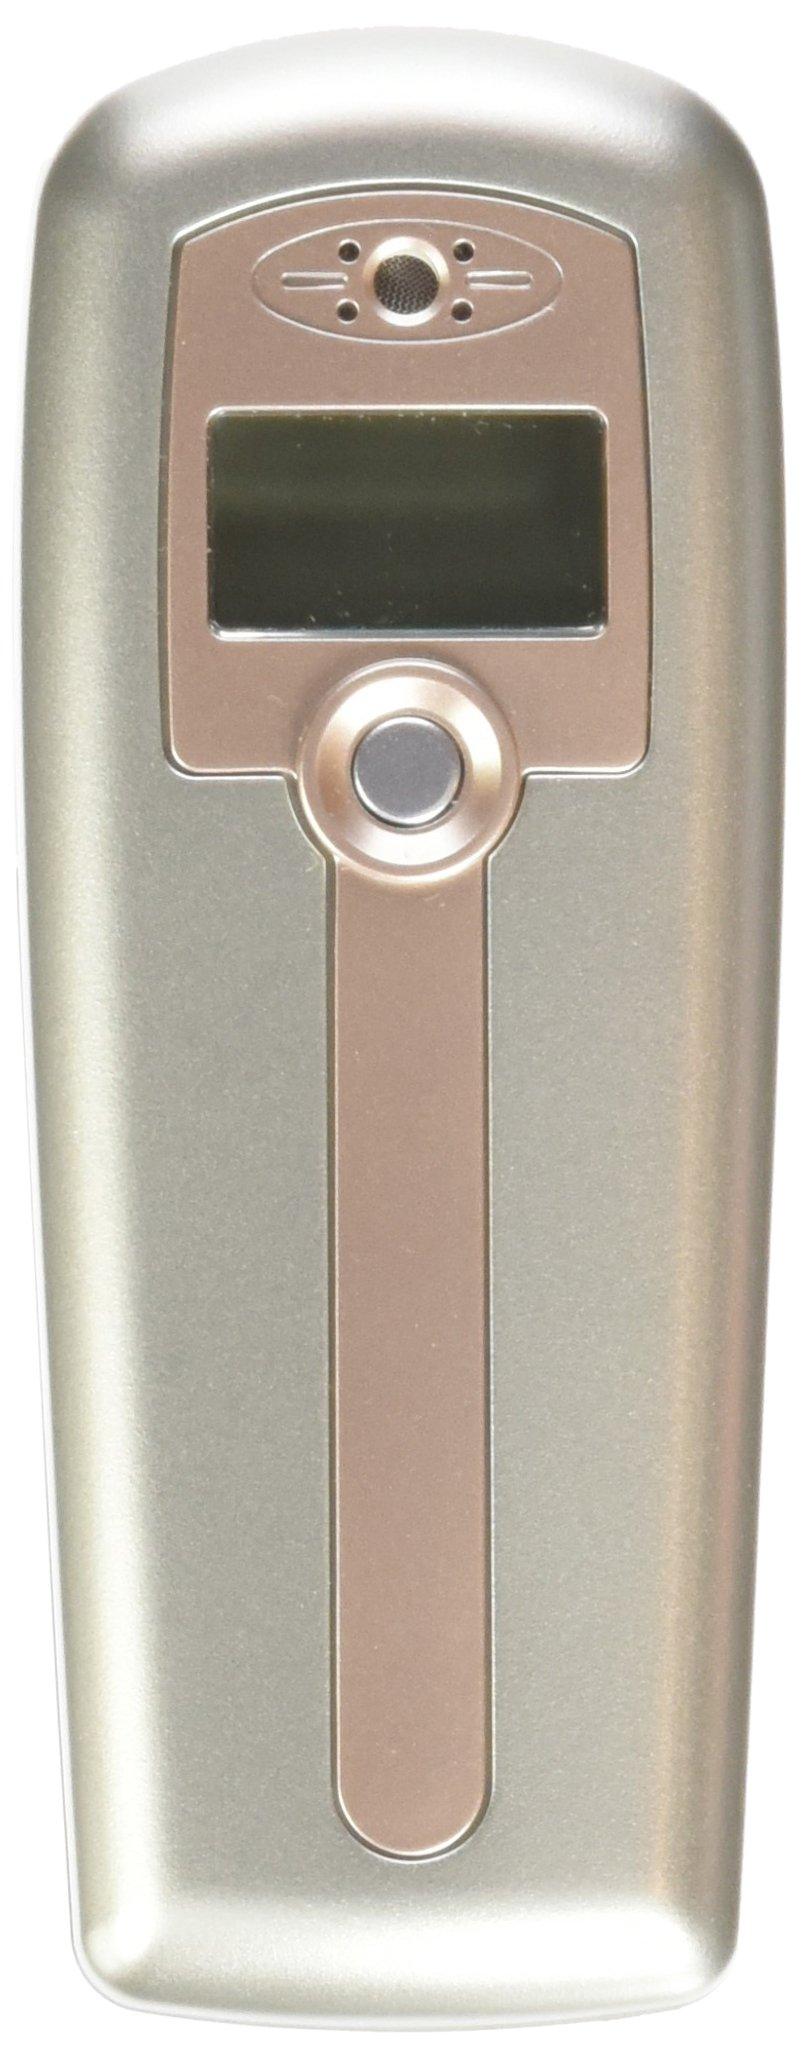 AL2500 Breathalyzer by AlcoMate